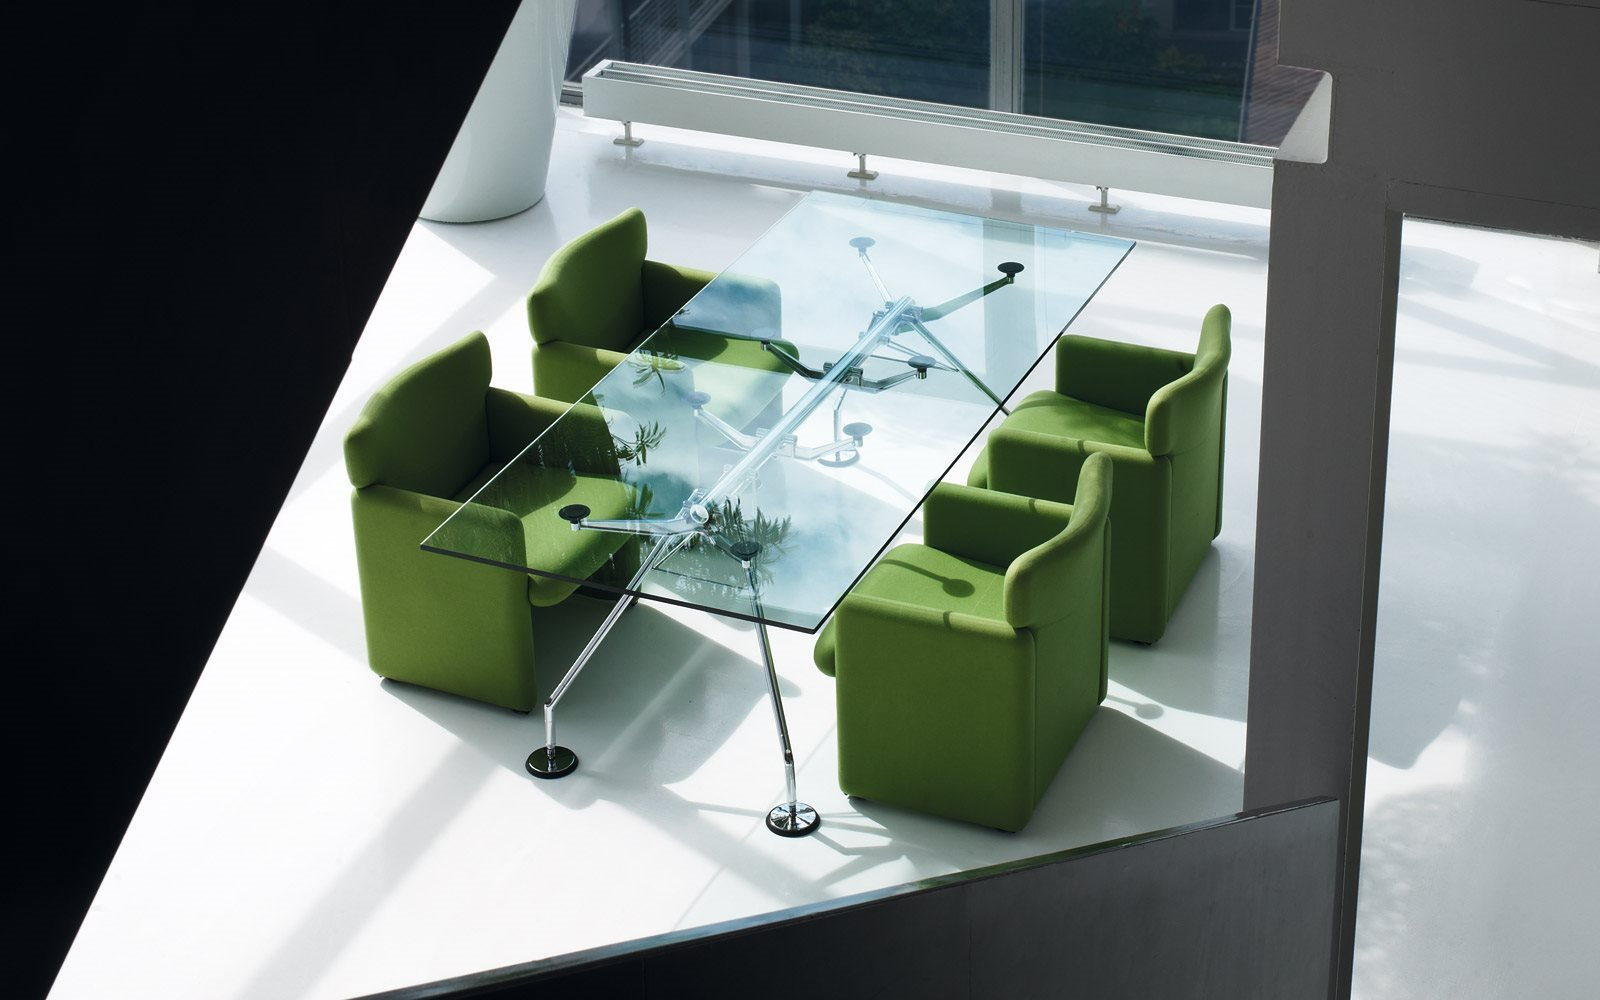 nomos table. Black Bedroom Furniture Sets. Home Design Ideas